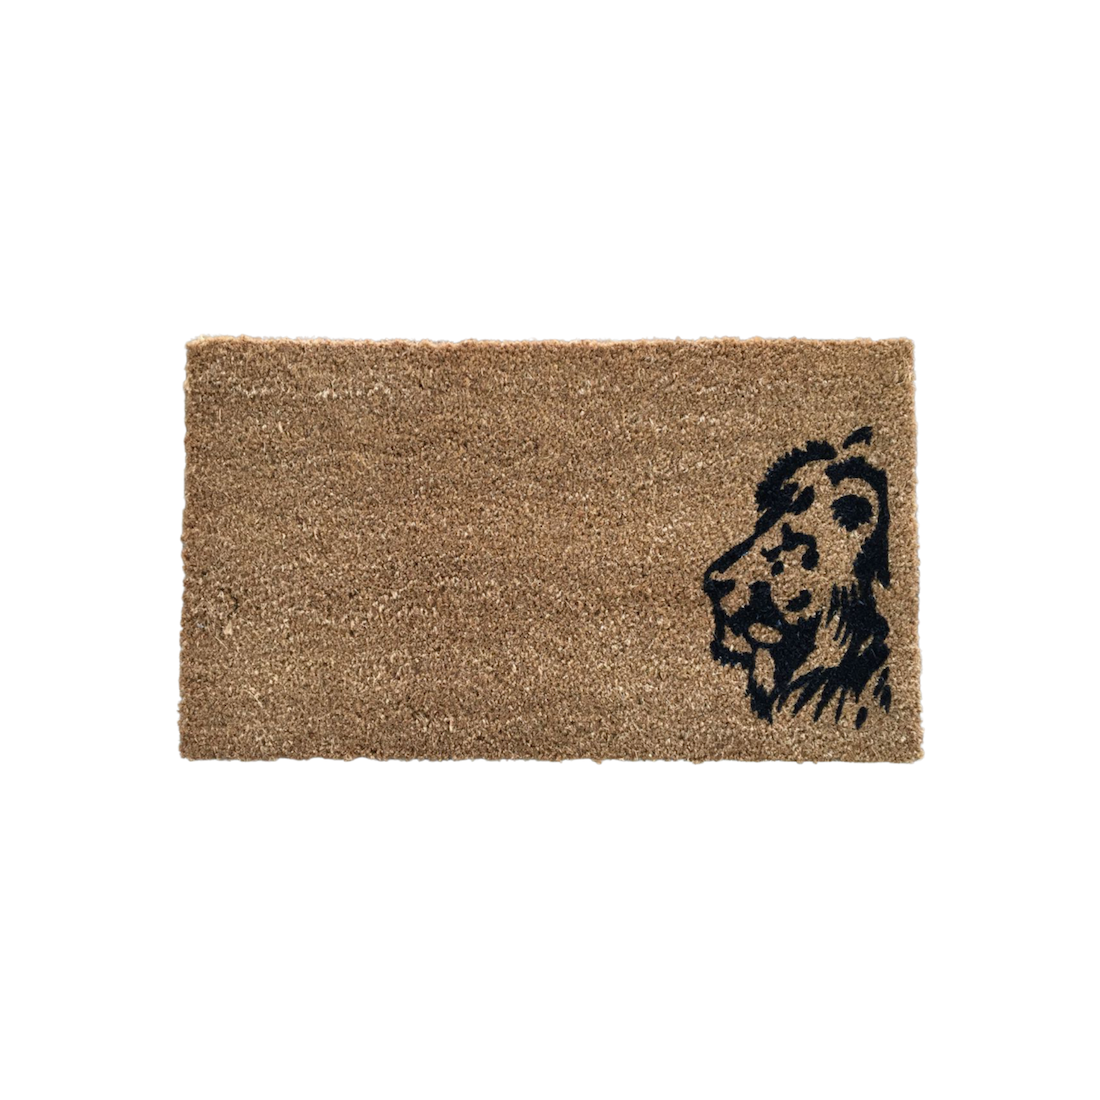 Matnifique Coir Doormat - Lion Design 700 x 400 x 14mm